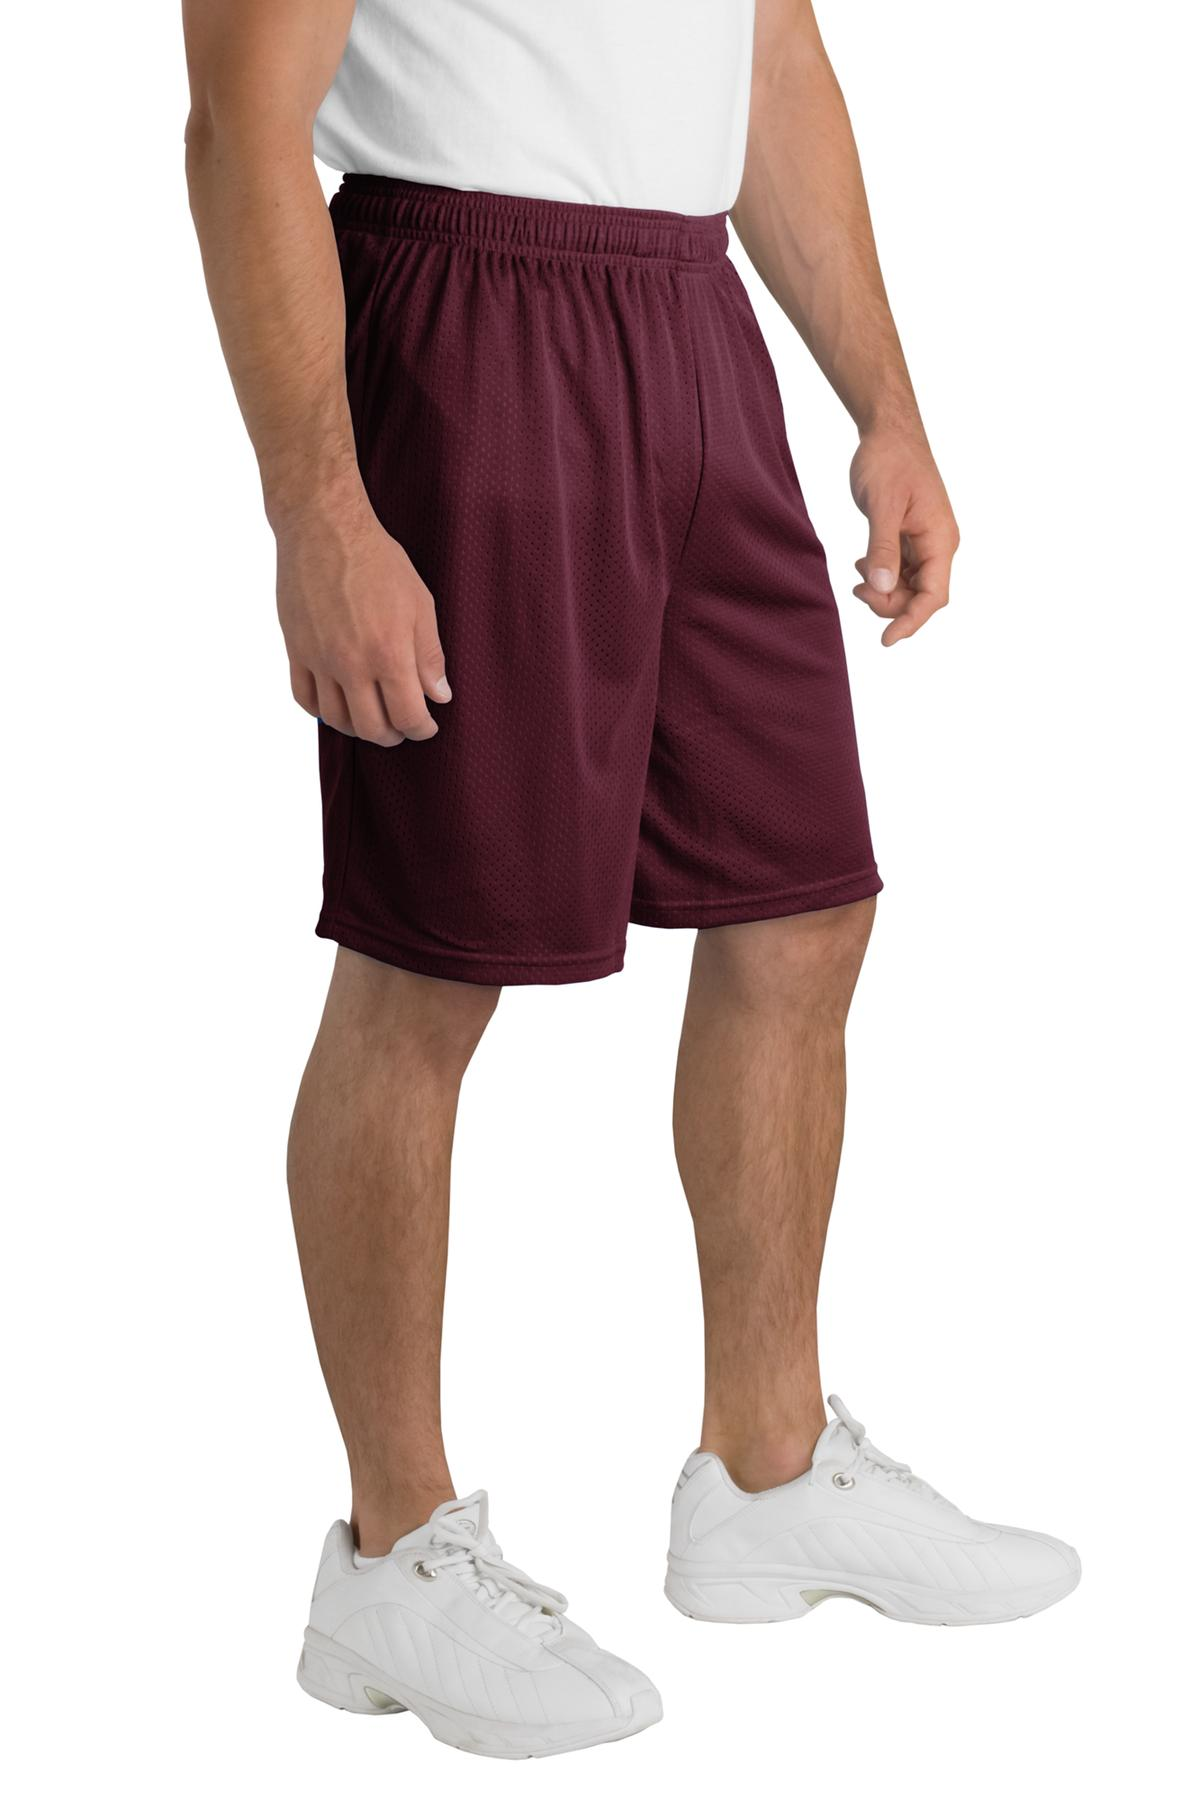 Sport-Tek Men's Elastic Waistband Classic Mesh Short